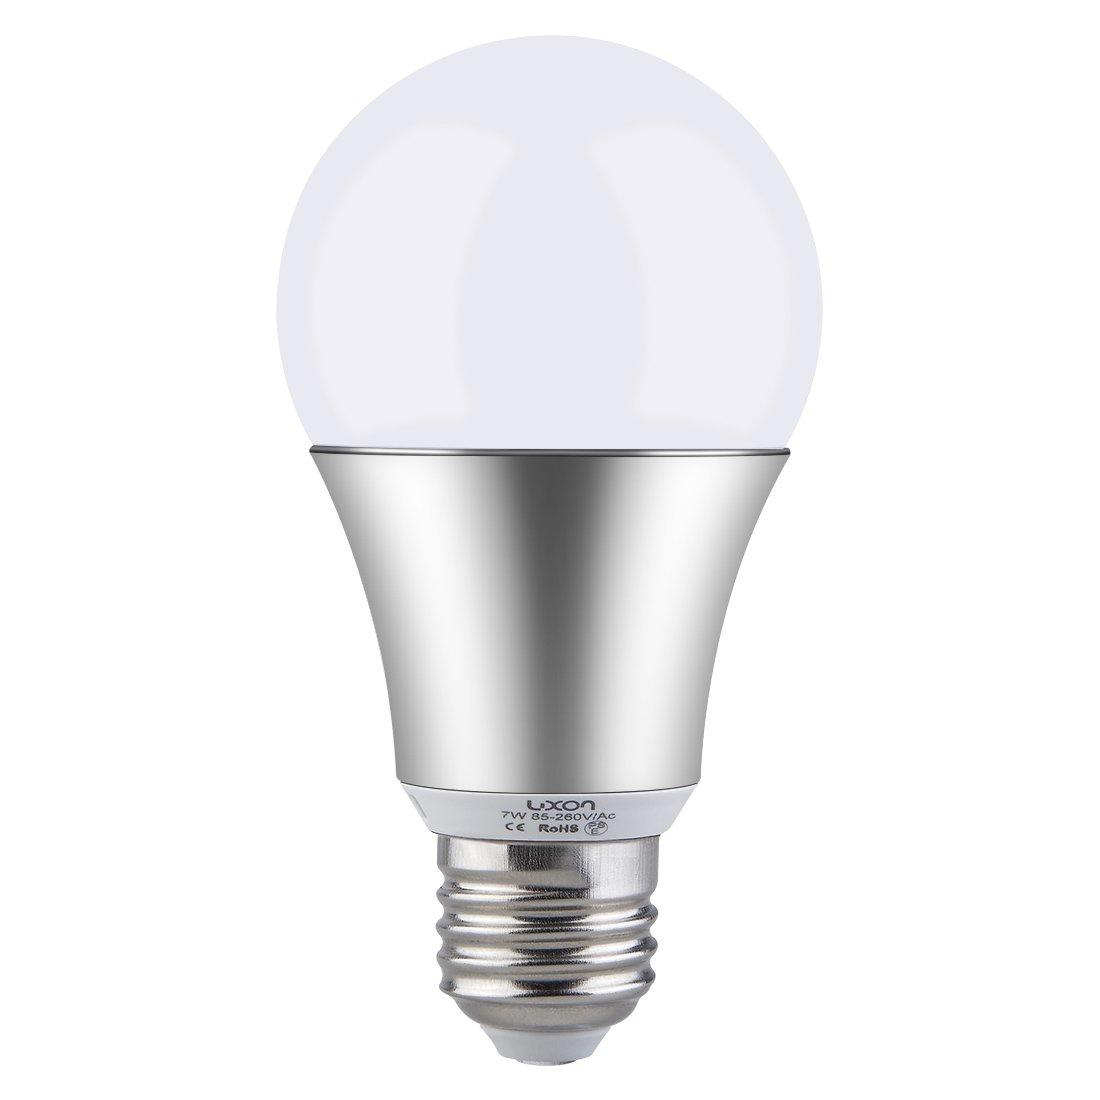 LUXON Motion Sensor Light Bulb 7W Smart Bulb Radar Dusk to Dawn LED Motion Sensor Light Bulbs E26 Base Indoor Sensor Night Lights Soft White 2700K Outdoor Motion Sensor Bulb Auto On/Off